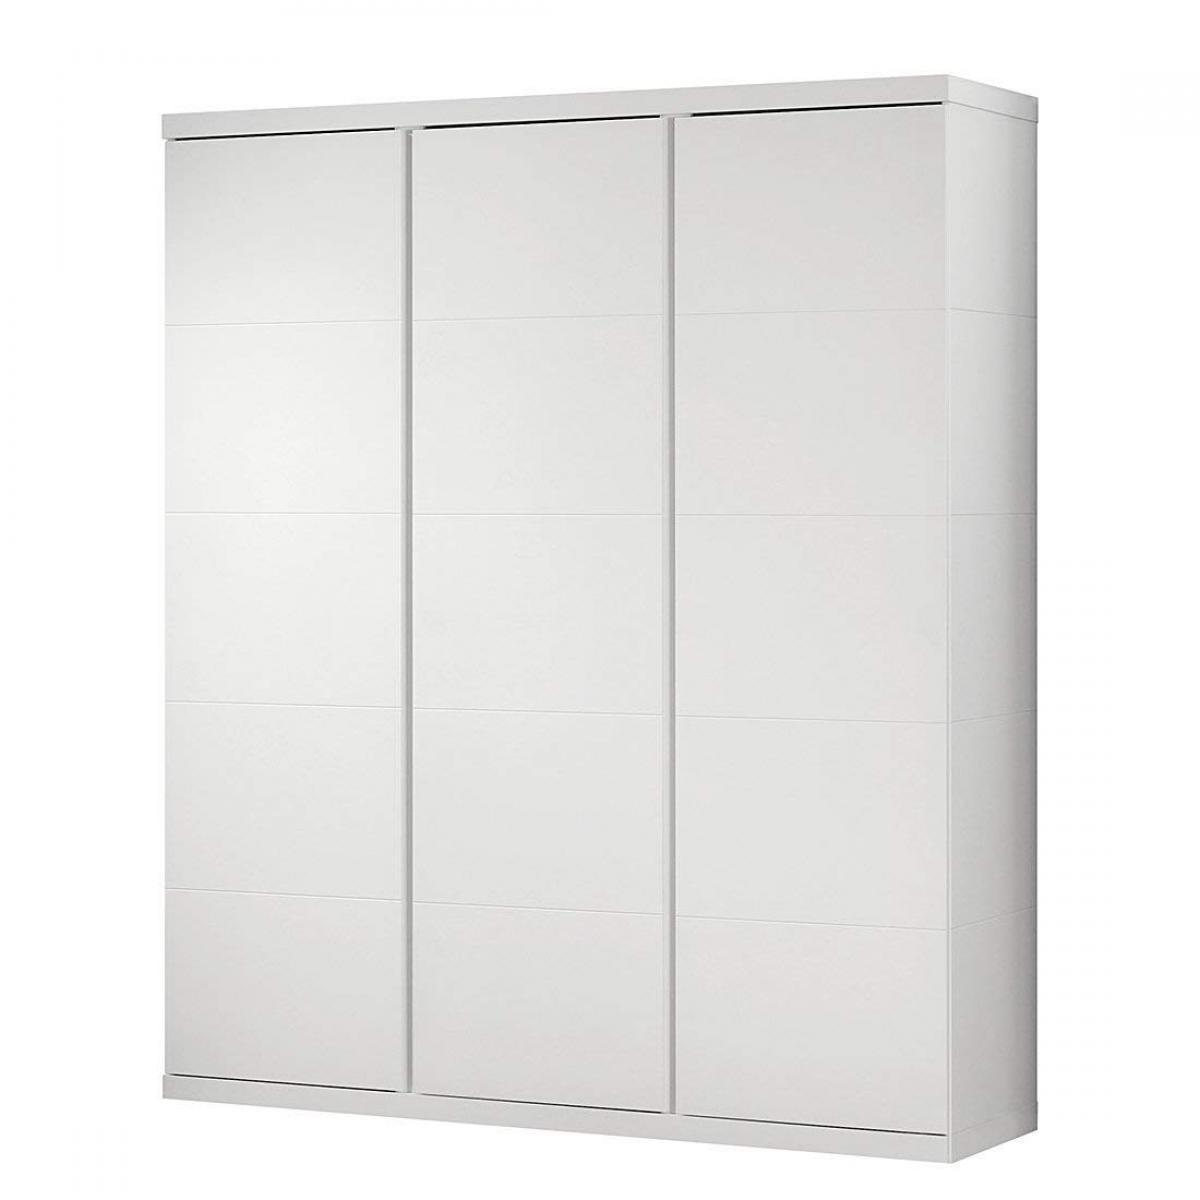 Vipack Vipack LARA Armoire 3 portes laqué blanc